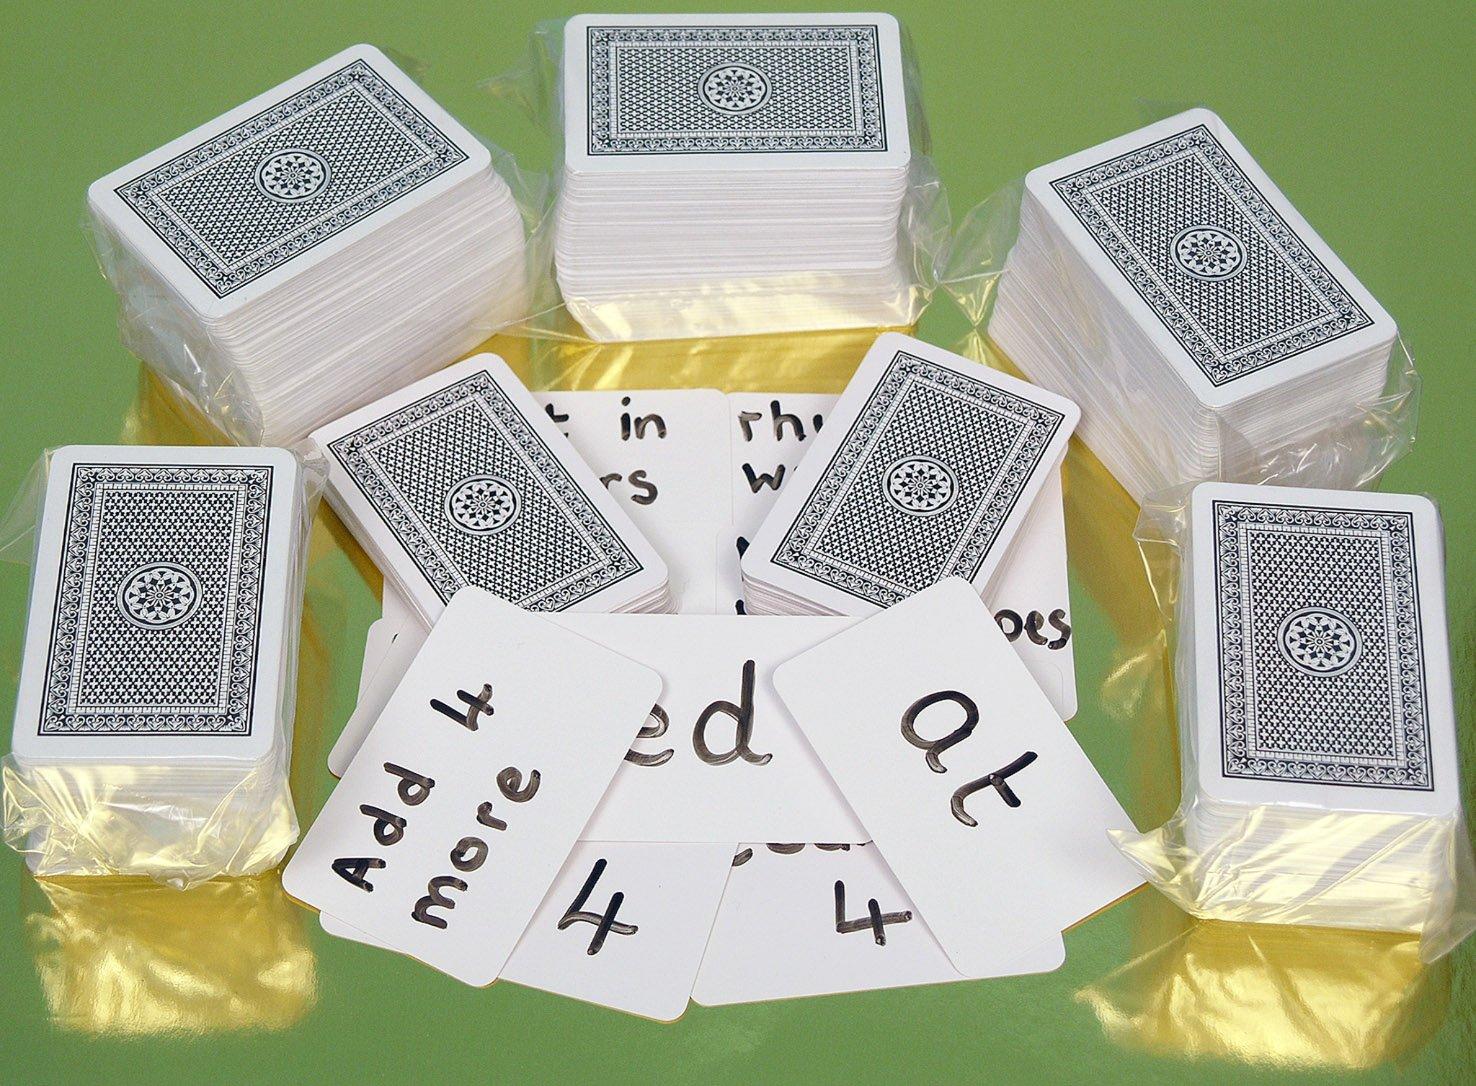 YiFeiCT 10 Pcs Duplicator EM4305 T5577 Clone Proximity Badge Writable Rewrite Copy 125khz RFID Tag llavero Porta Chave Card Sticker Key Fob Token Ring